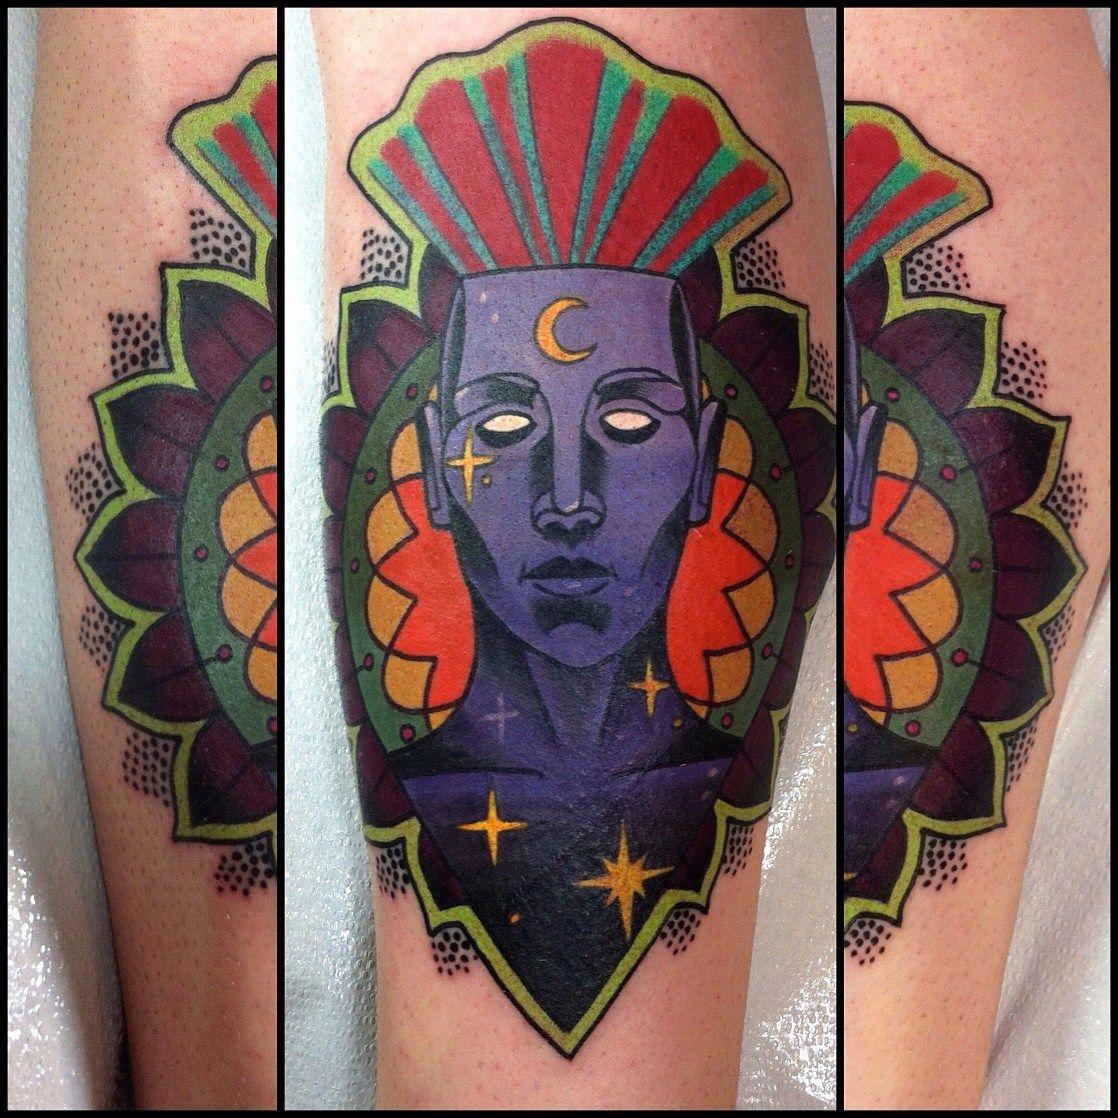 Geary morrill tattoos gallery eclectic art art tattoo